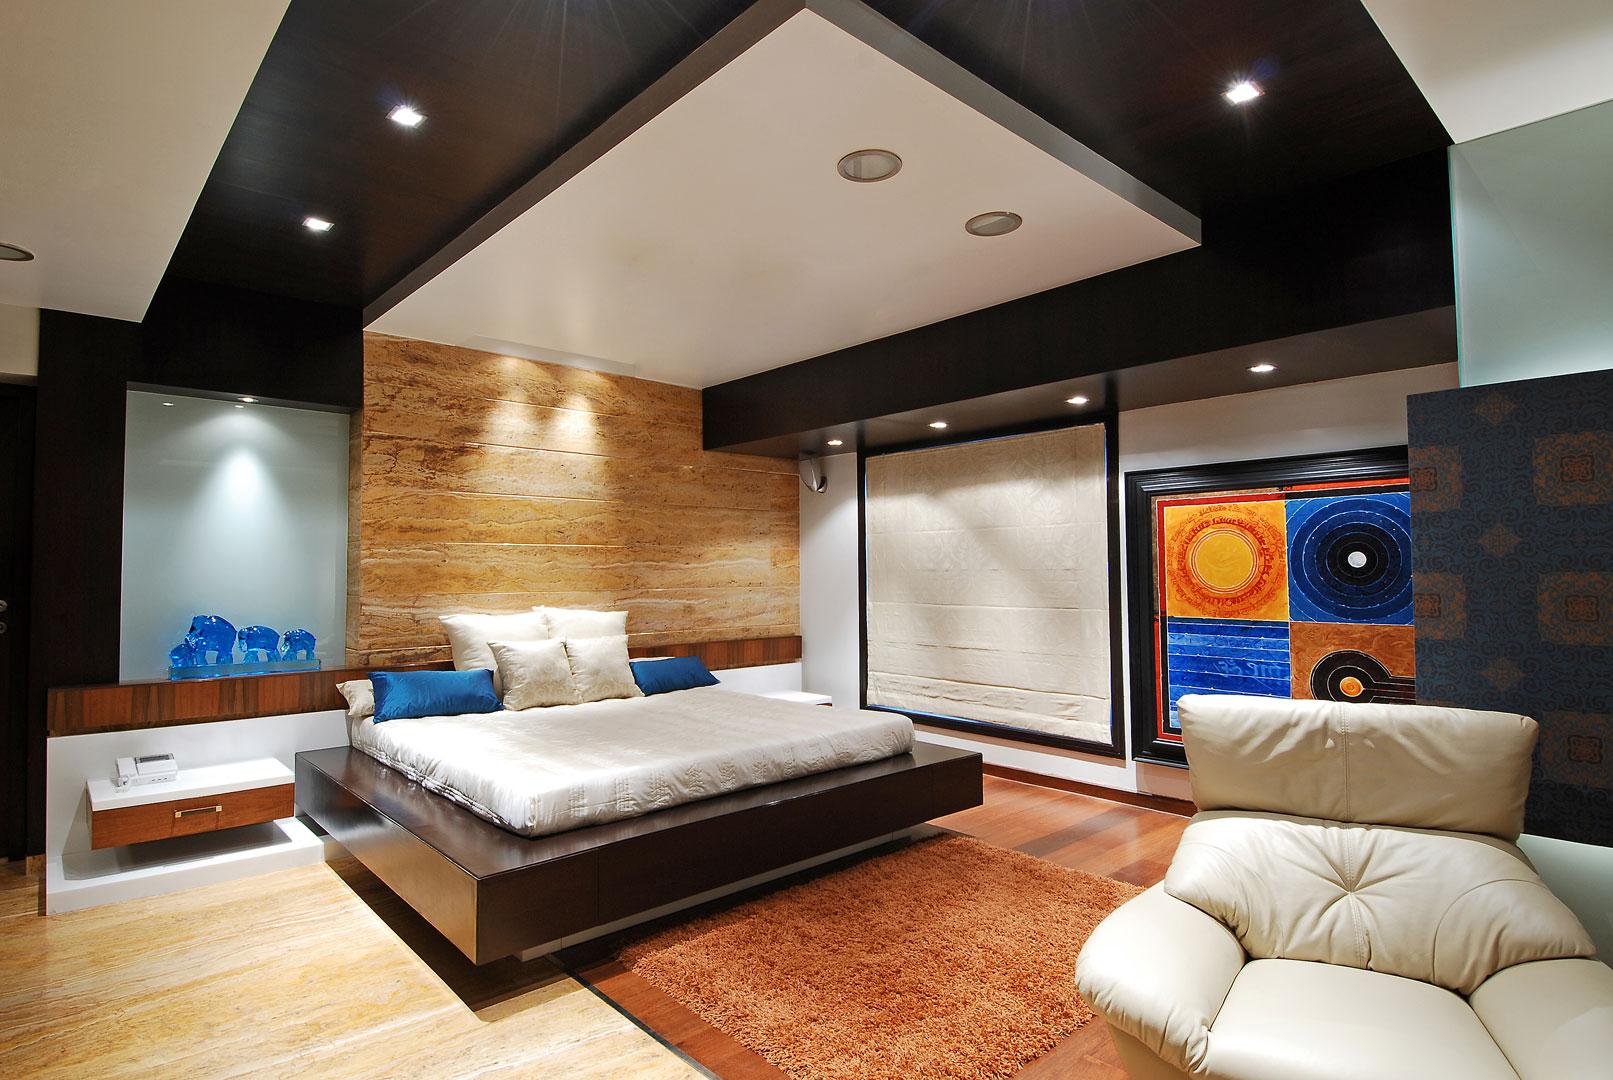 zz_architects_krupa_zubin_zainuddin_contemporary_apartments_interiors_maheshwari_shikharkunj_goregaon_mumbai_09